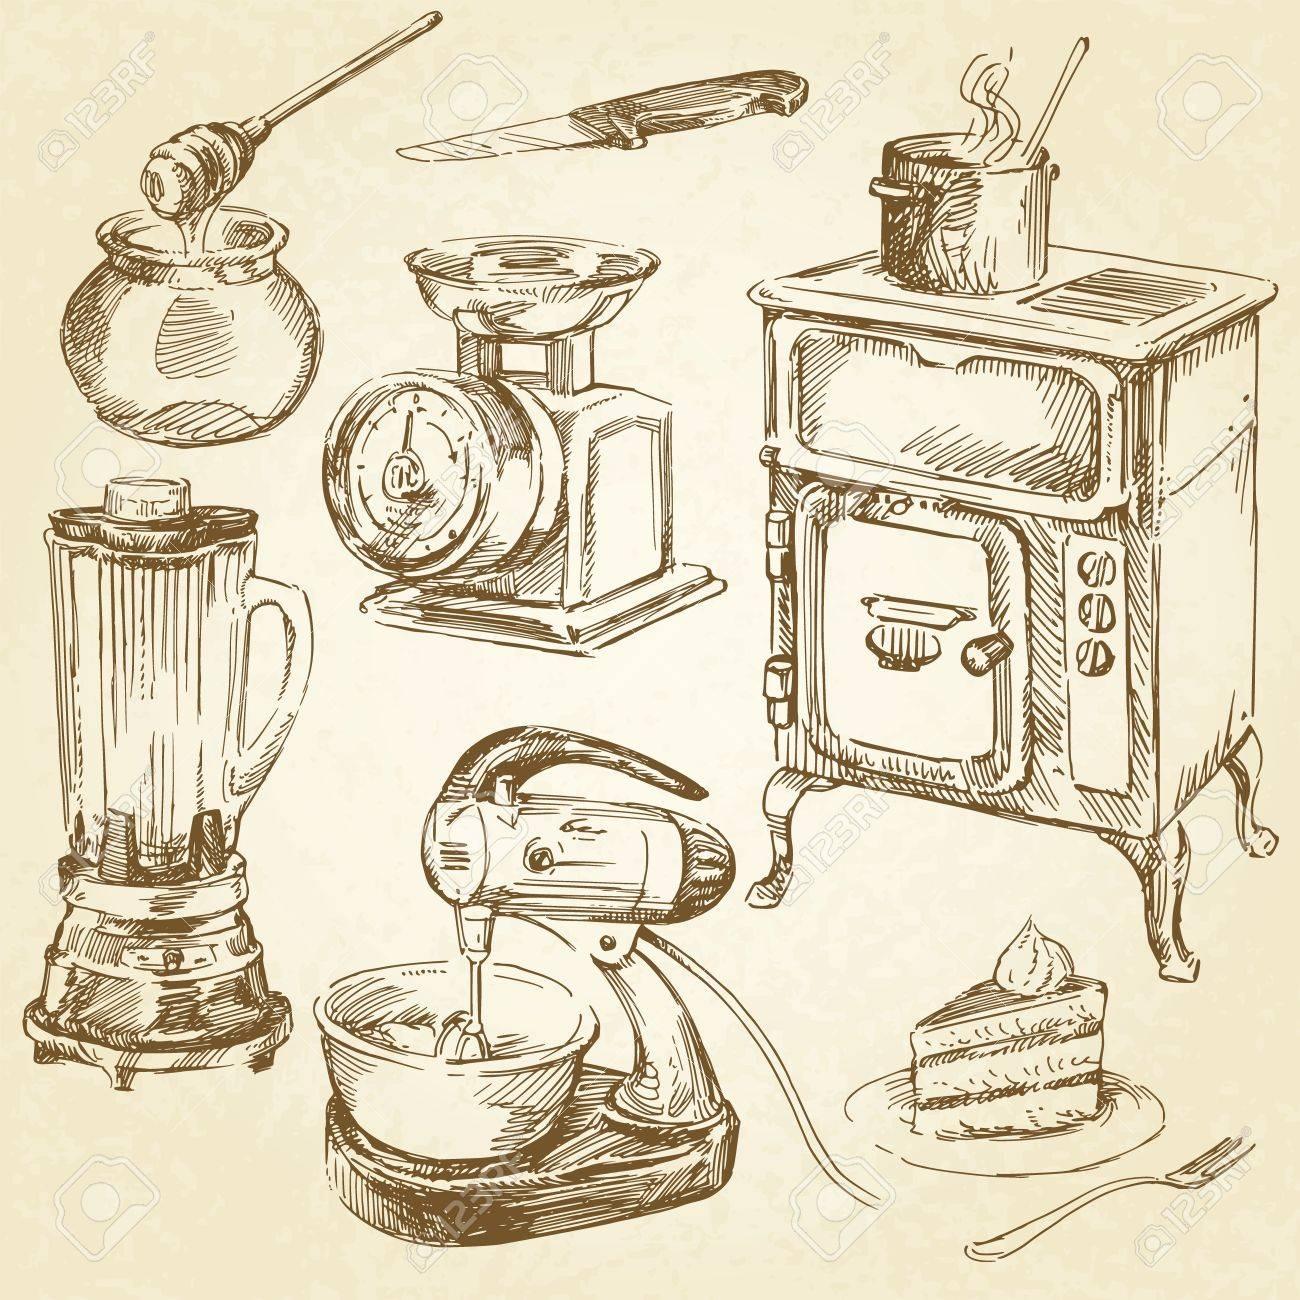 Vintage Kitchen Utensils Illustration vintage cookware, kitchen utensil - hand drawn set royalty free